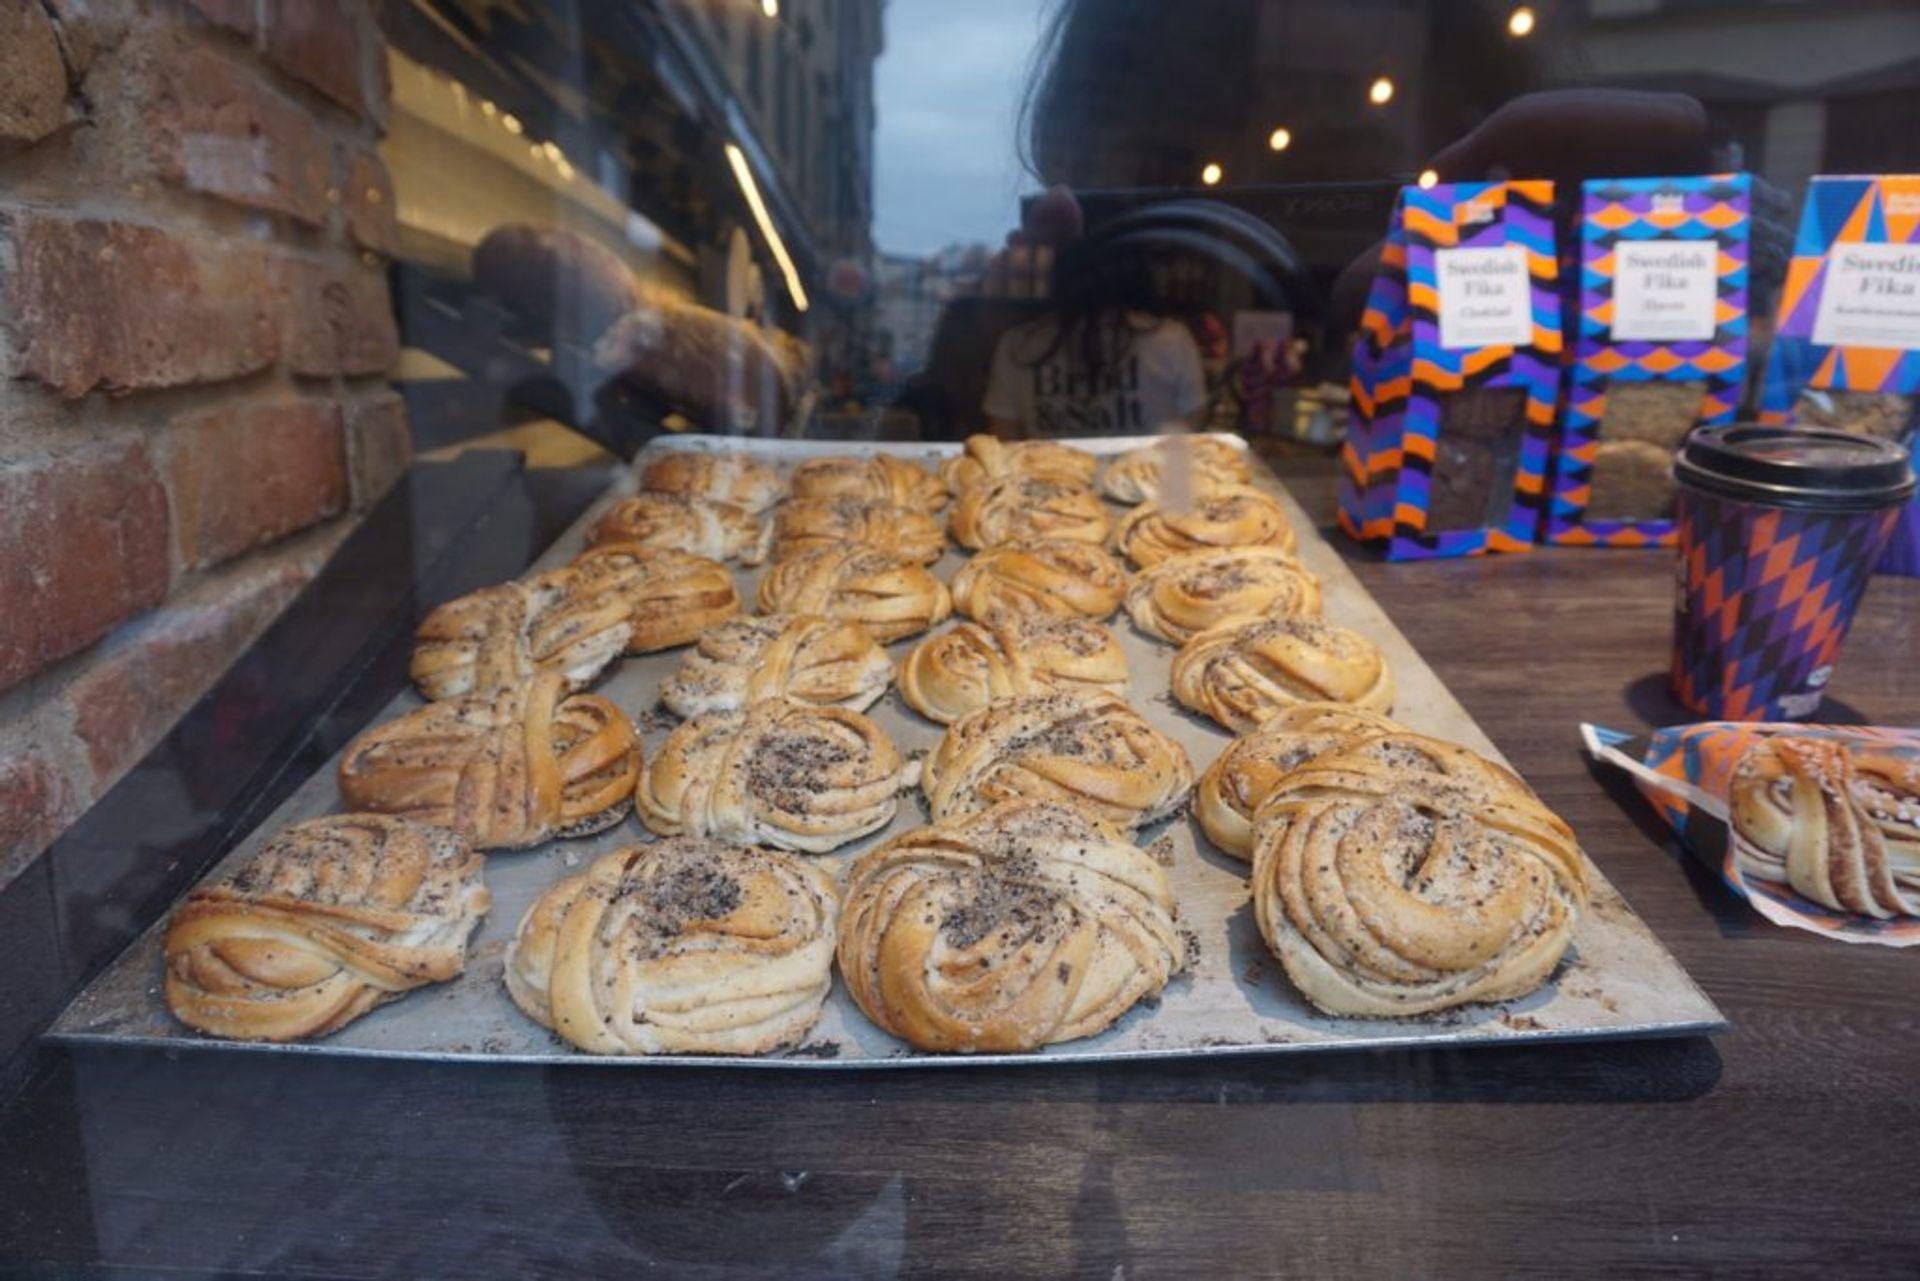 Close-up of a tray of cardamom buns.